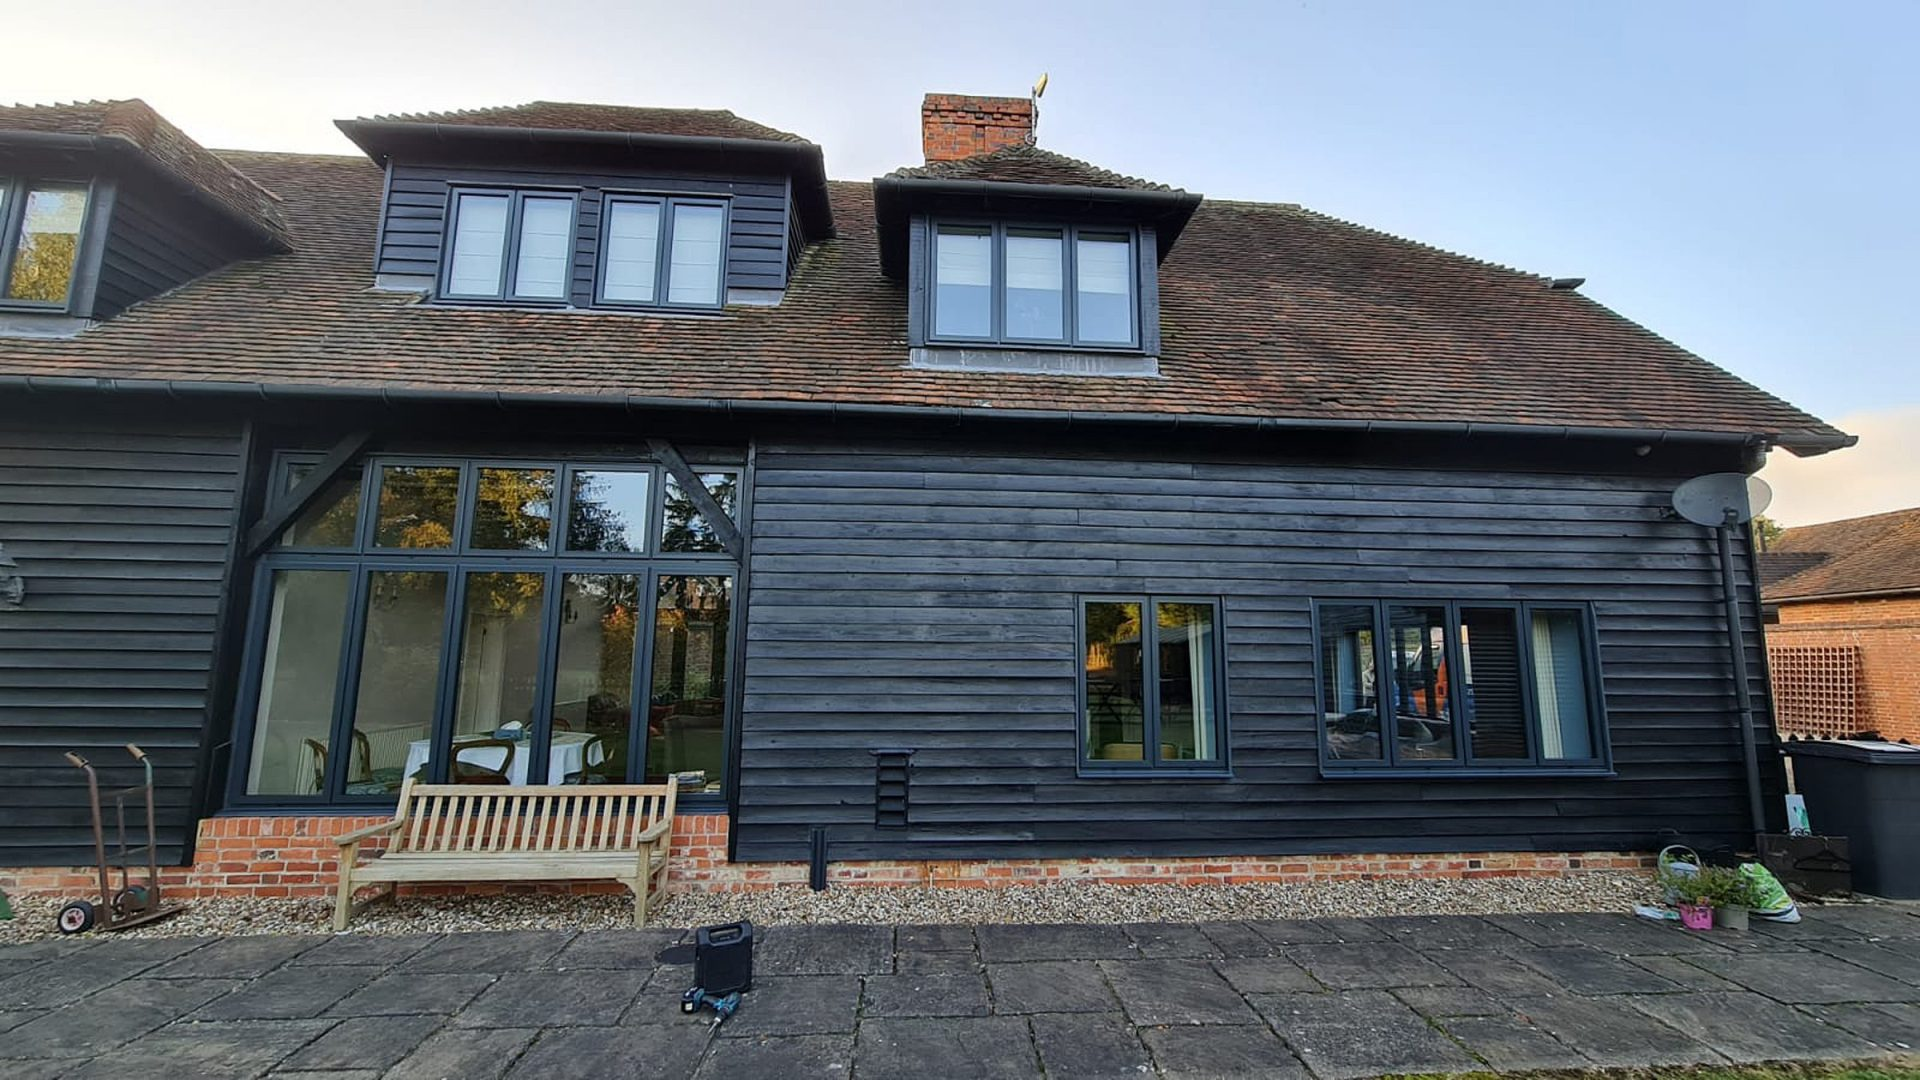 Aluminium Windows and Doors for Residential Homes in Basingstoke